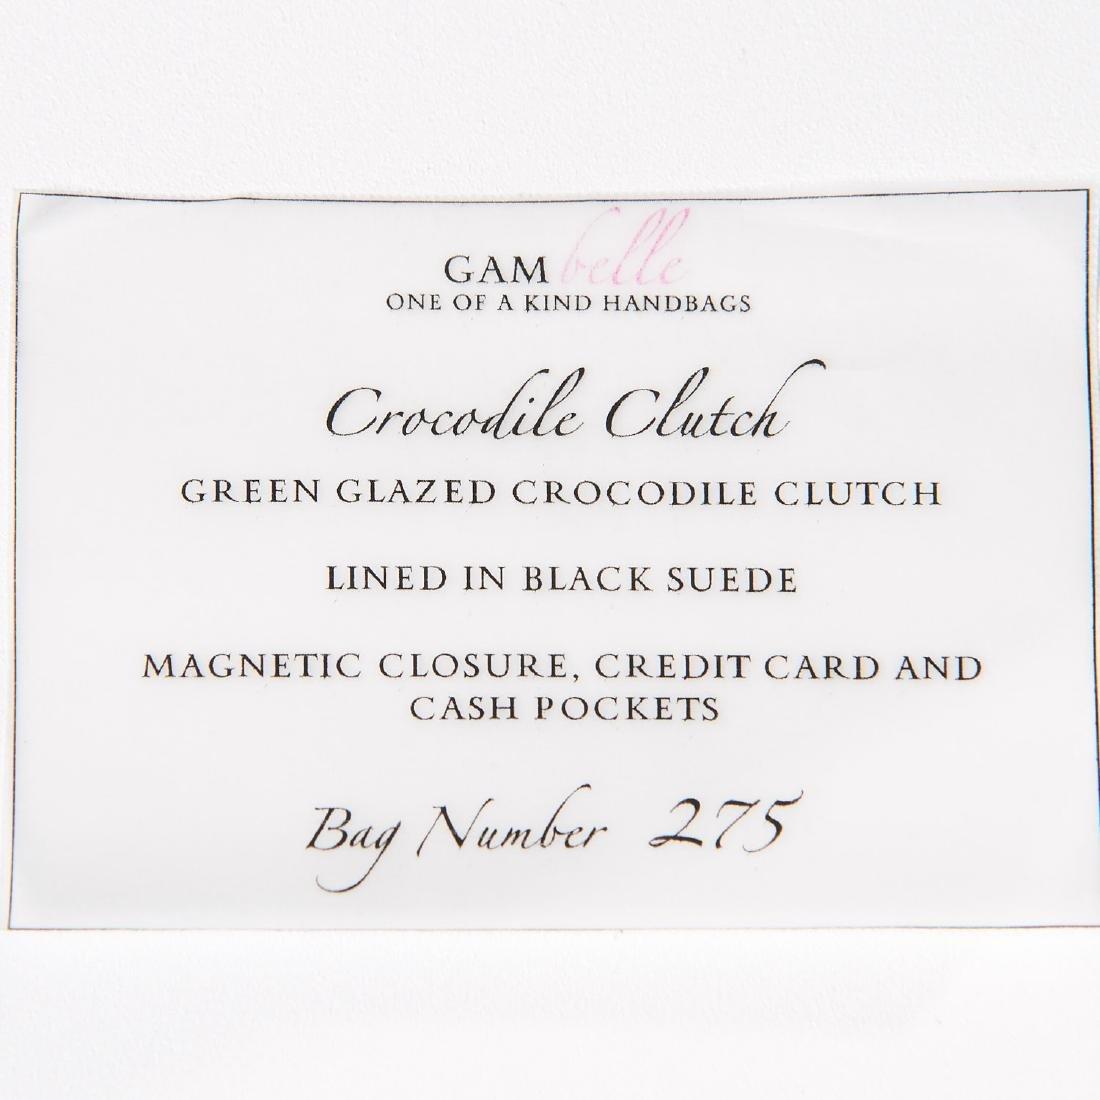 Gambelle green glazed crocodile clutch handbag - 5